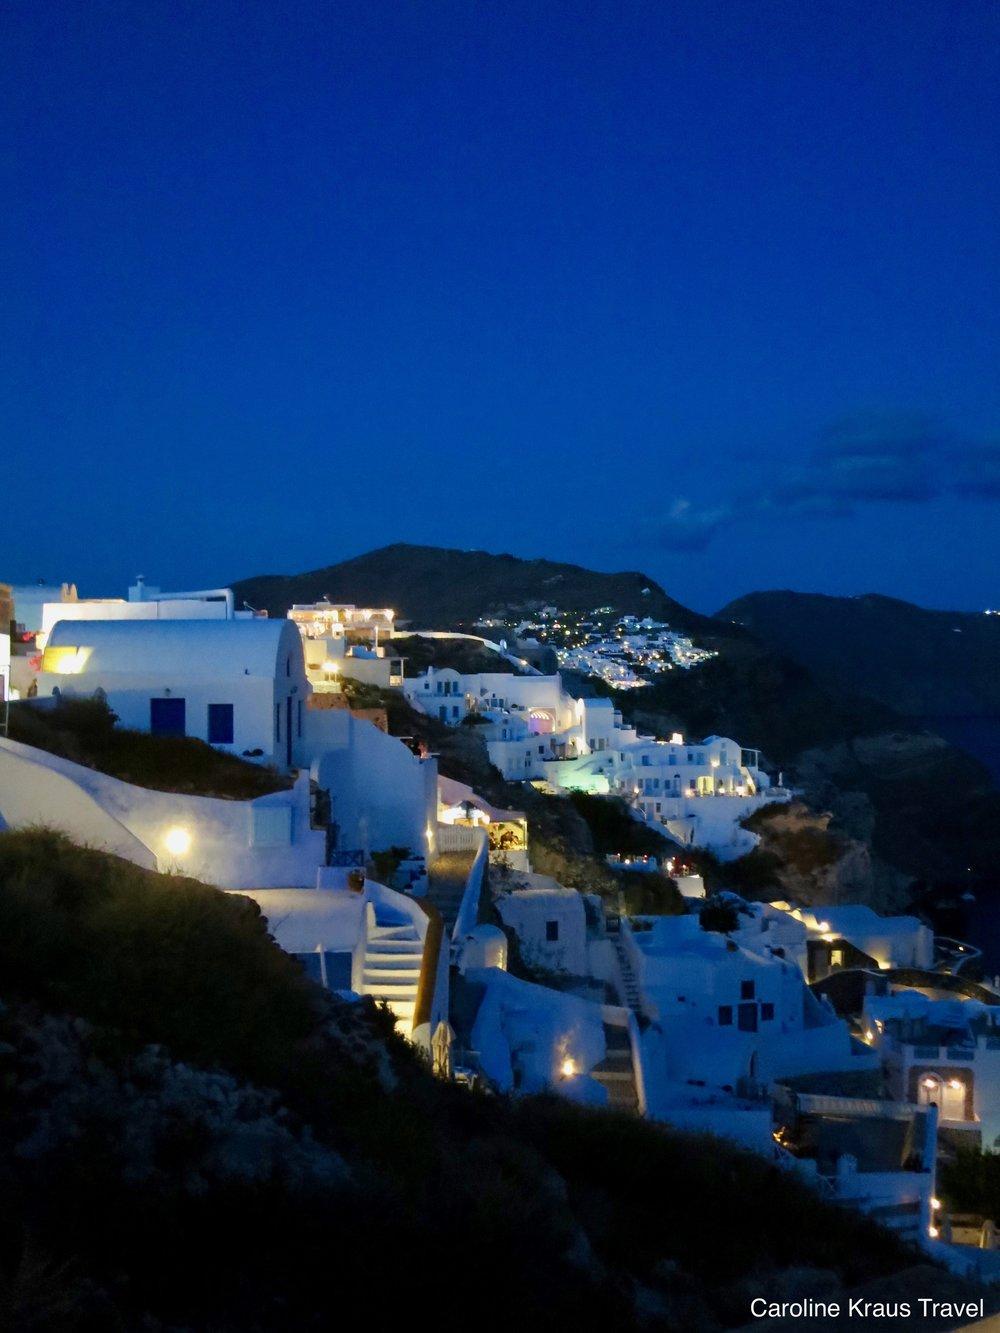 Imerovigli, Santorini, Greece at night